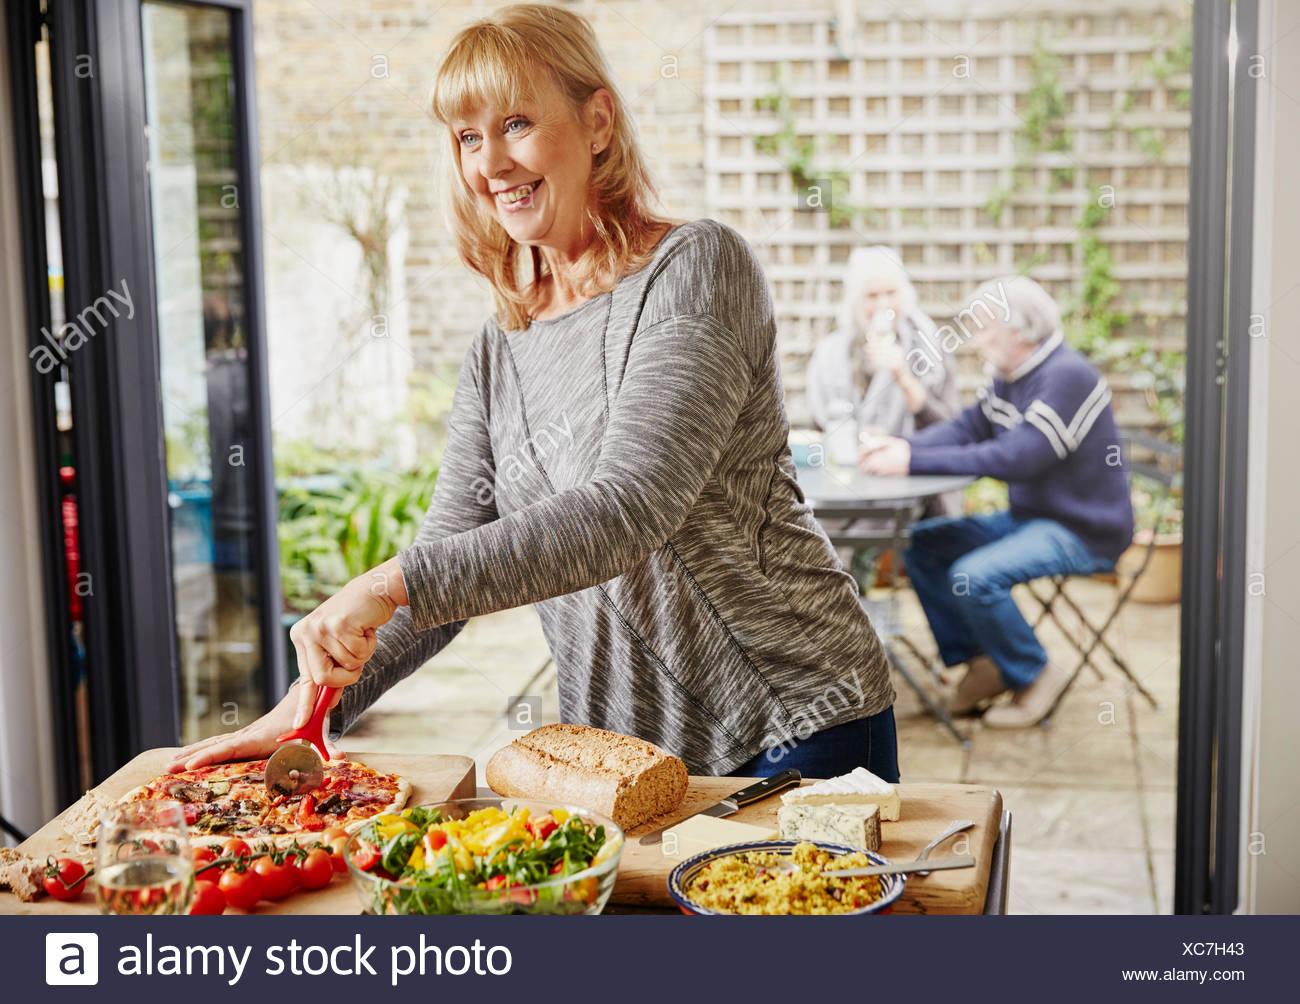 Mature woman cutting pizza - Stock Image